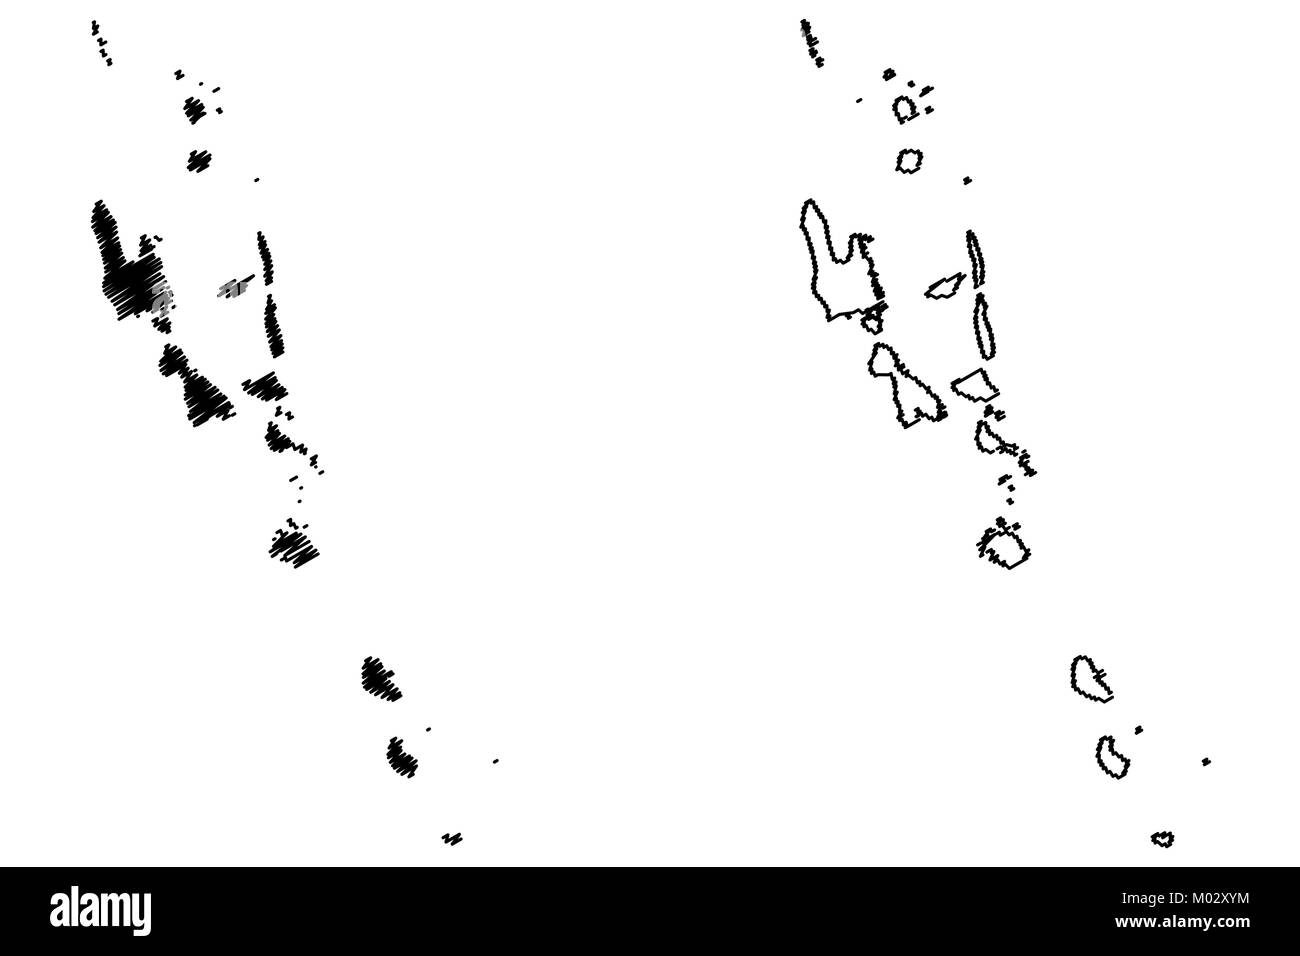 Vanuatu map vector illustration, scribble sketch Republic of Vanuatu, New Hebrides, - Stock Image